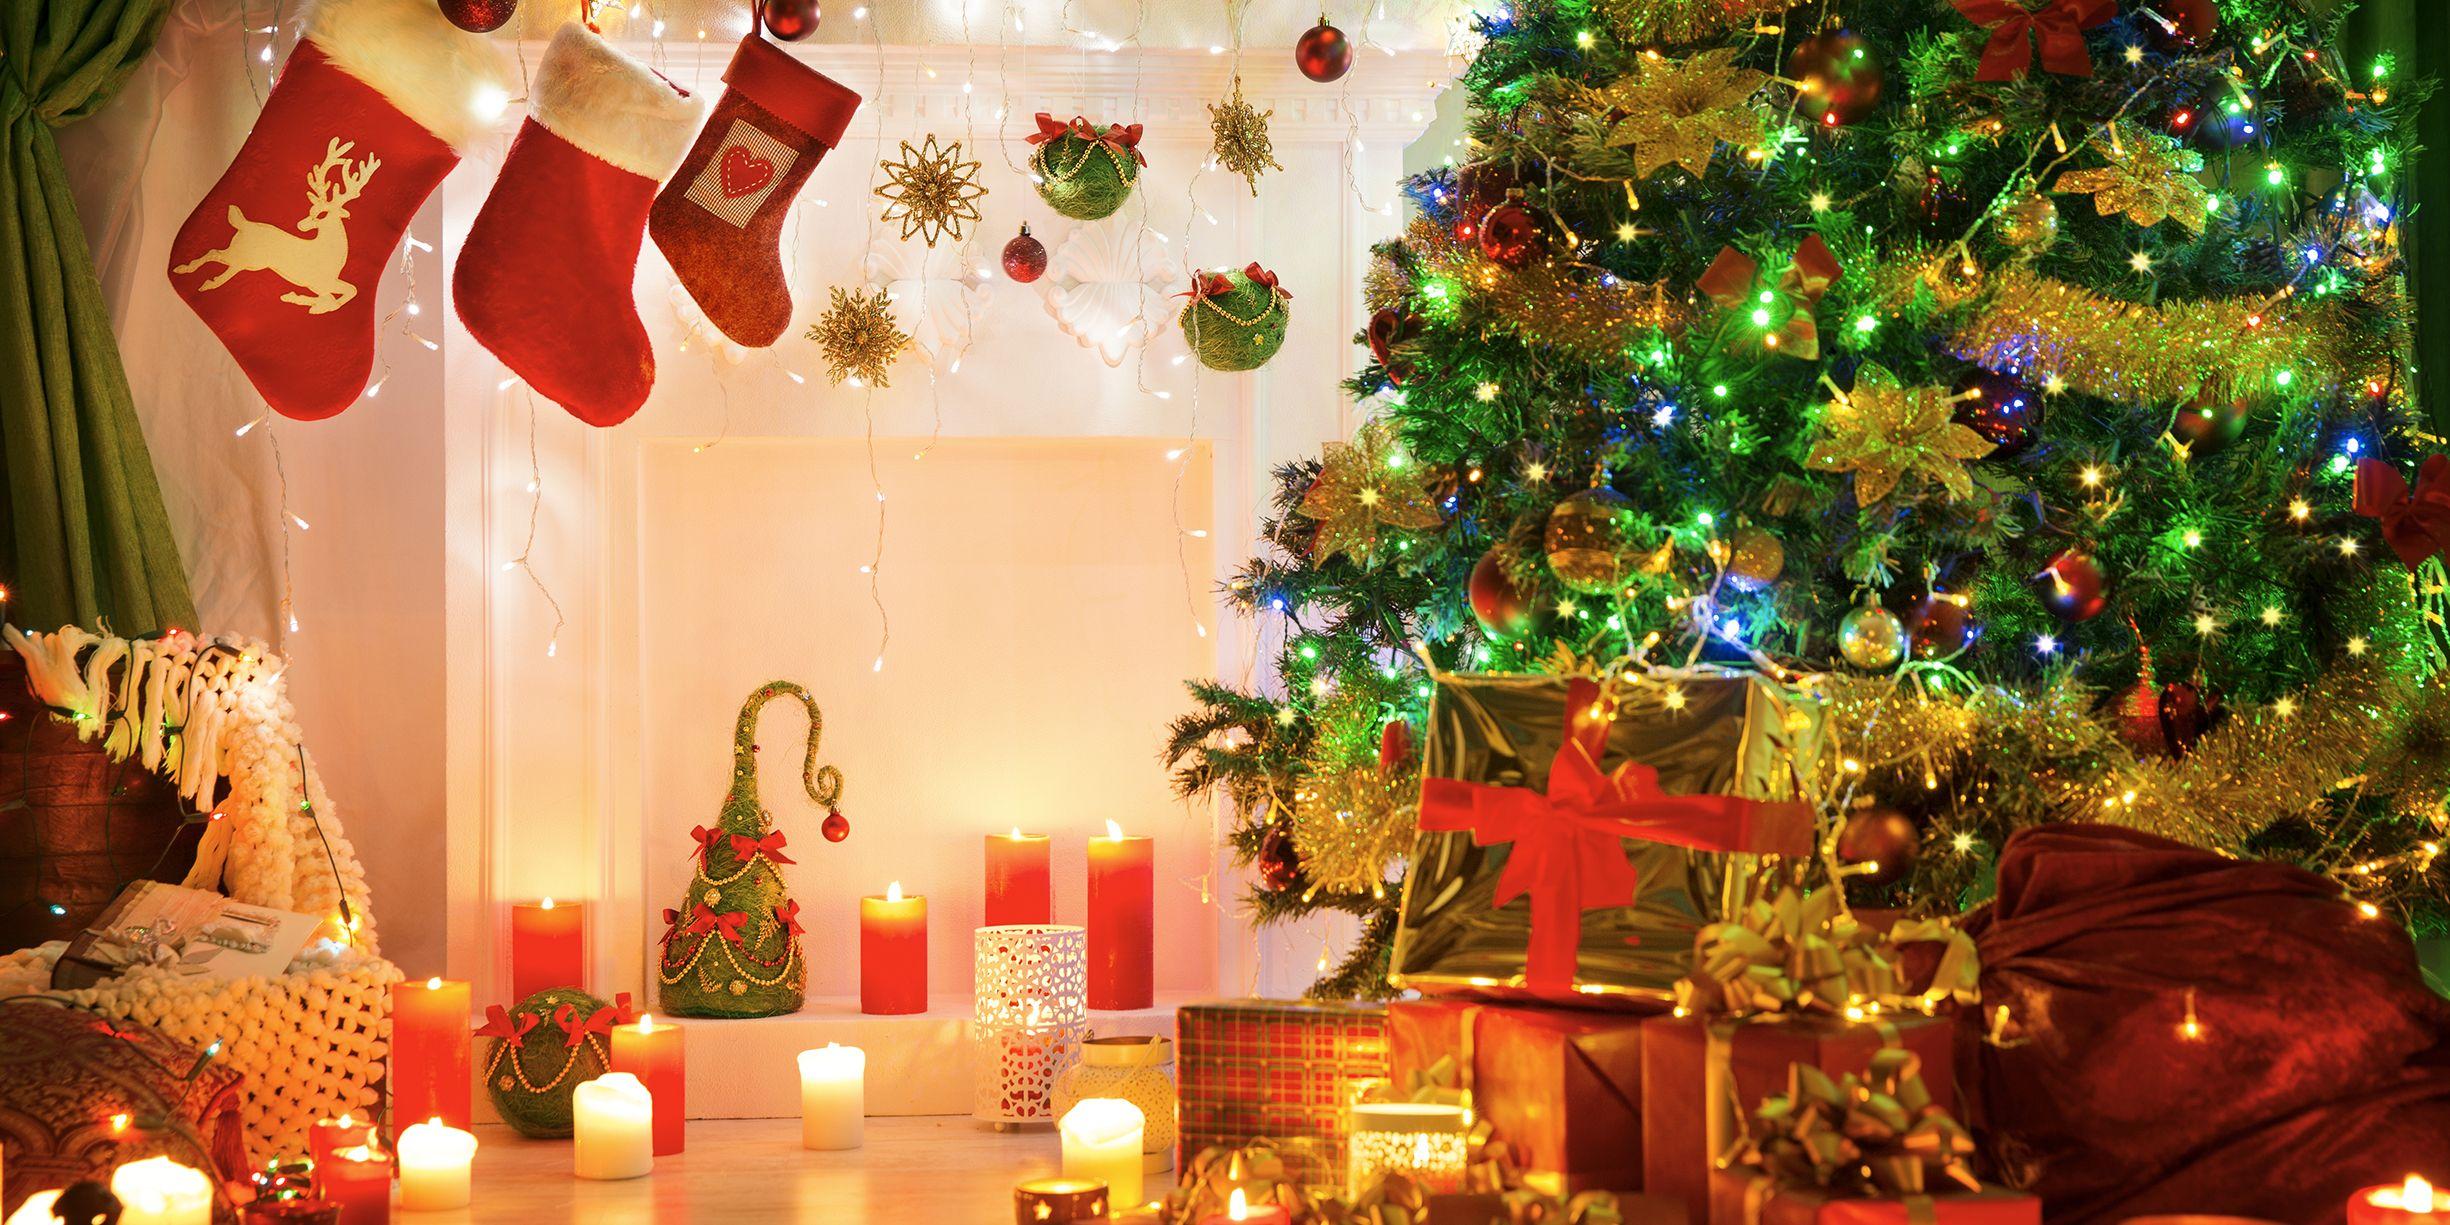 Home And Garden Christmas Tree Ideas